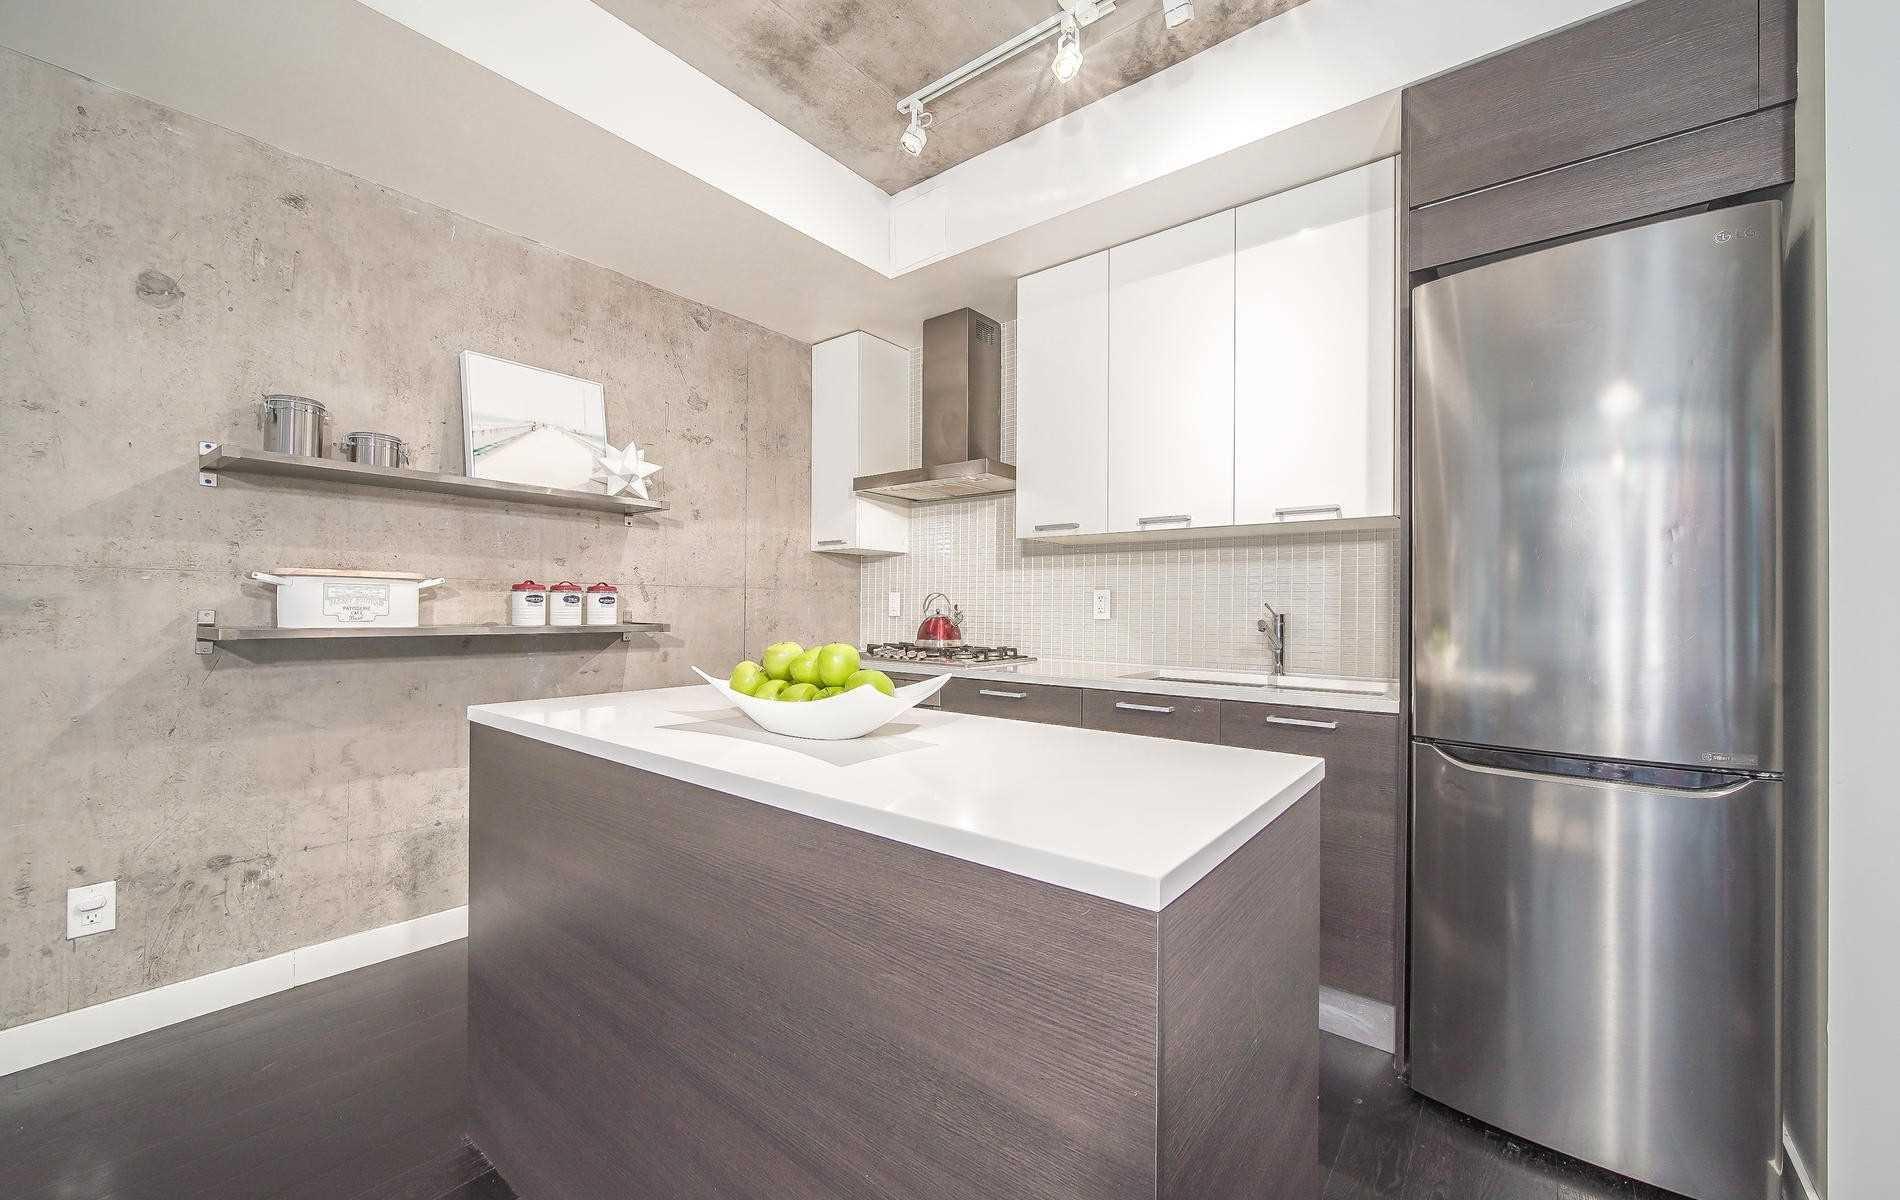 Photo 9: Photos: 408 90 Broadview Avenue in Toronto: South Riverdale Condo for sale (Toronto E01)  : MLS®# E4482454